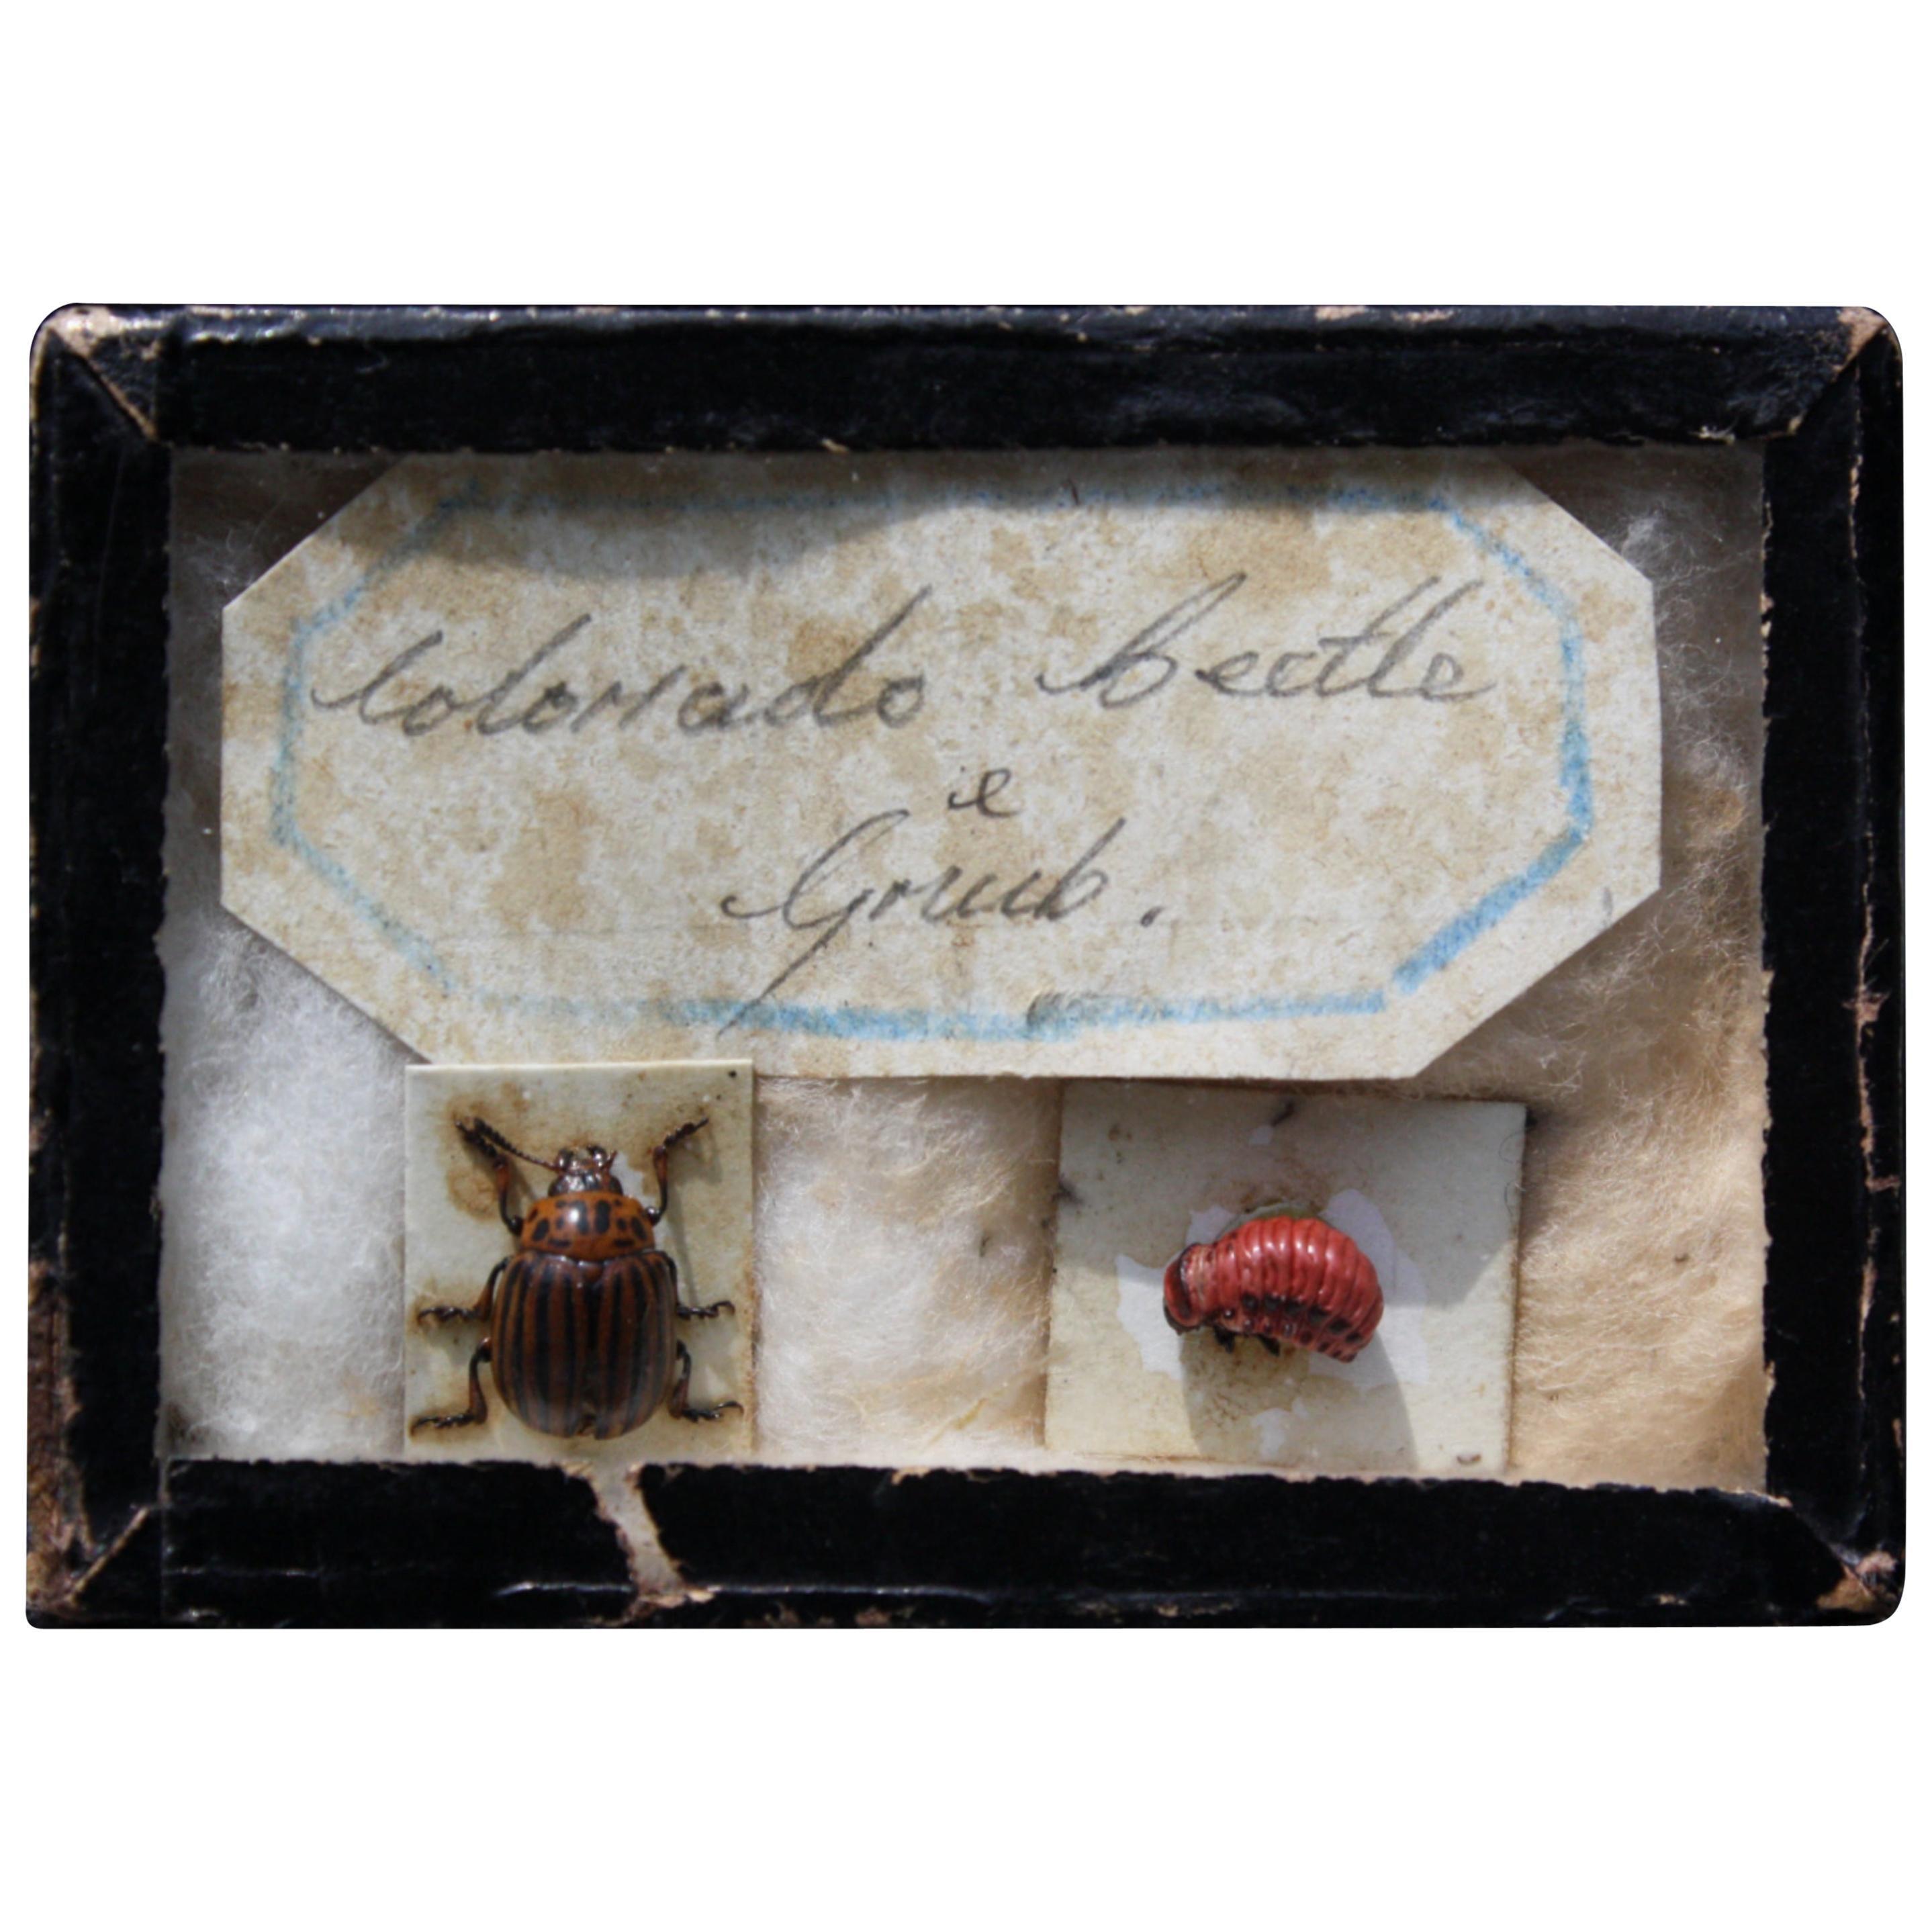 19th Century Colorado Beetle & Grub Farmers Specimen Taxidermy Curiosity